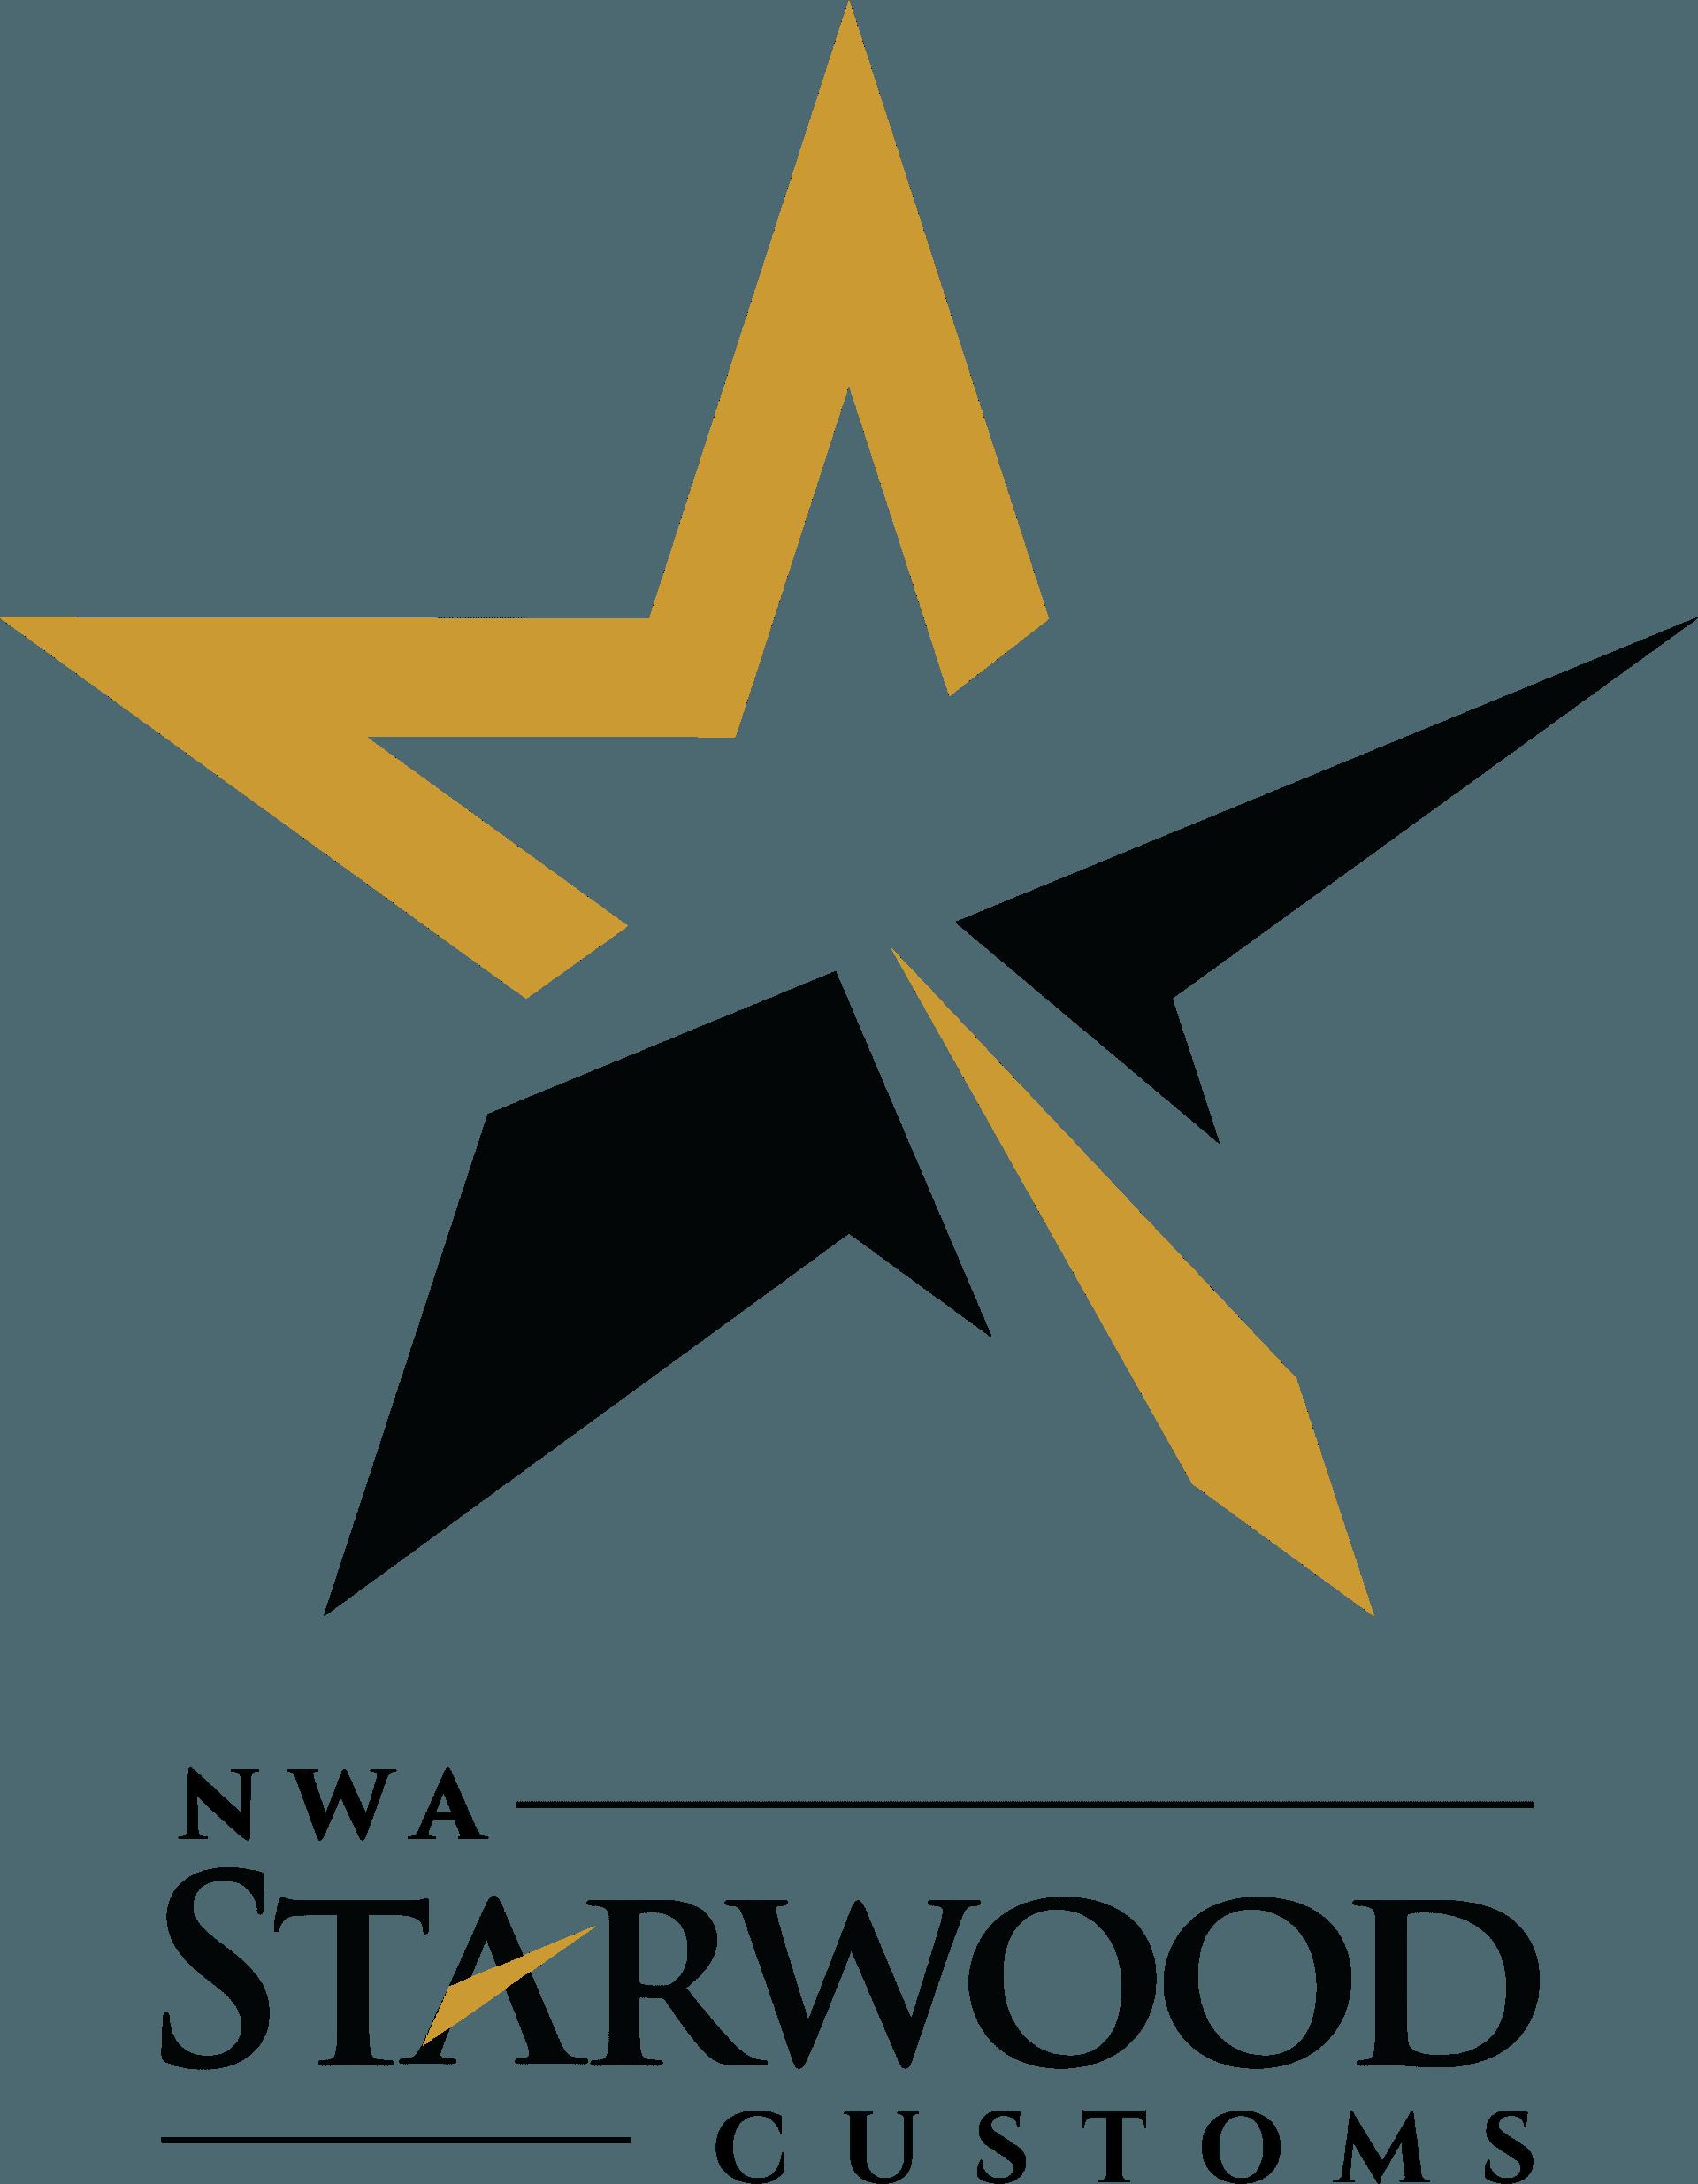 Starwood Customs NWA